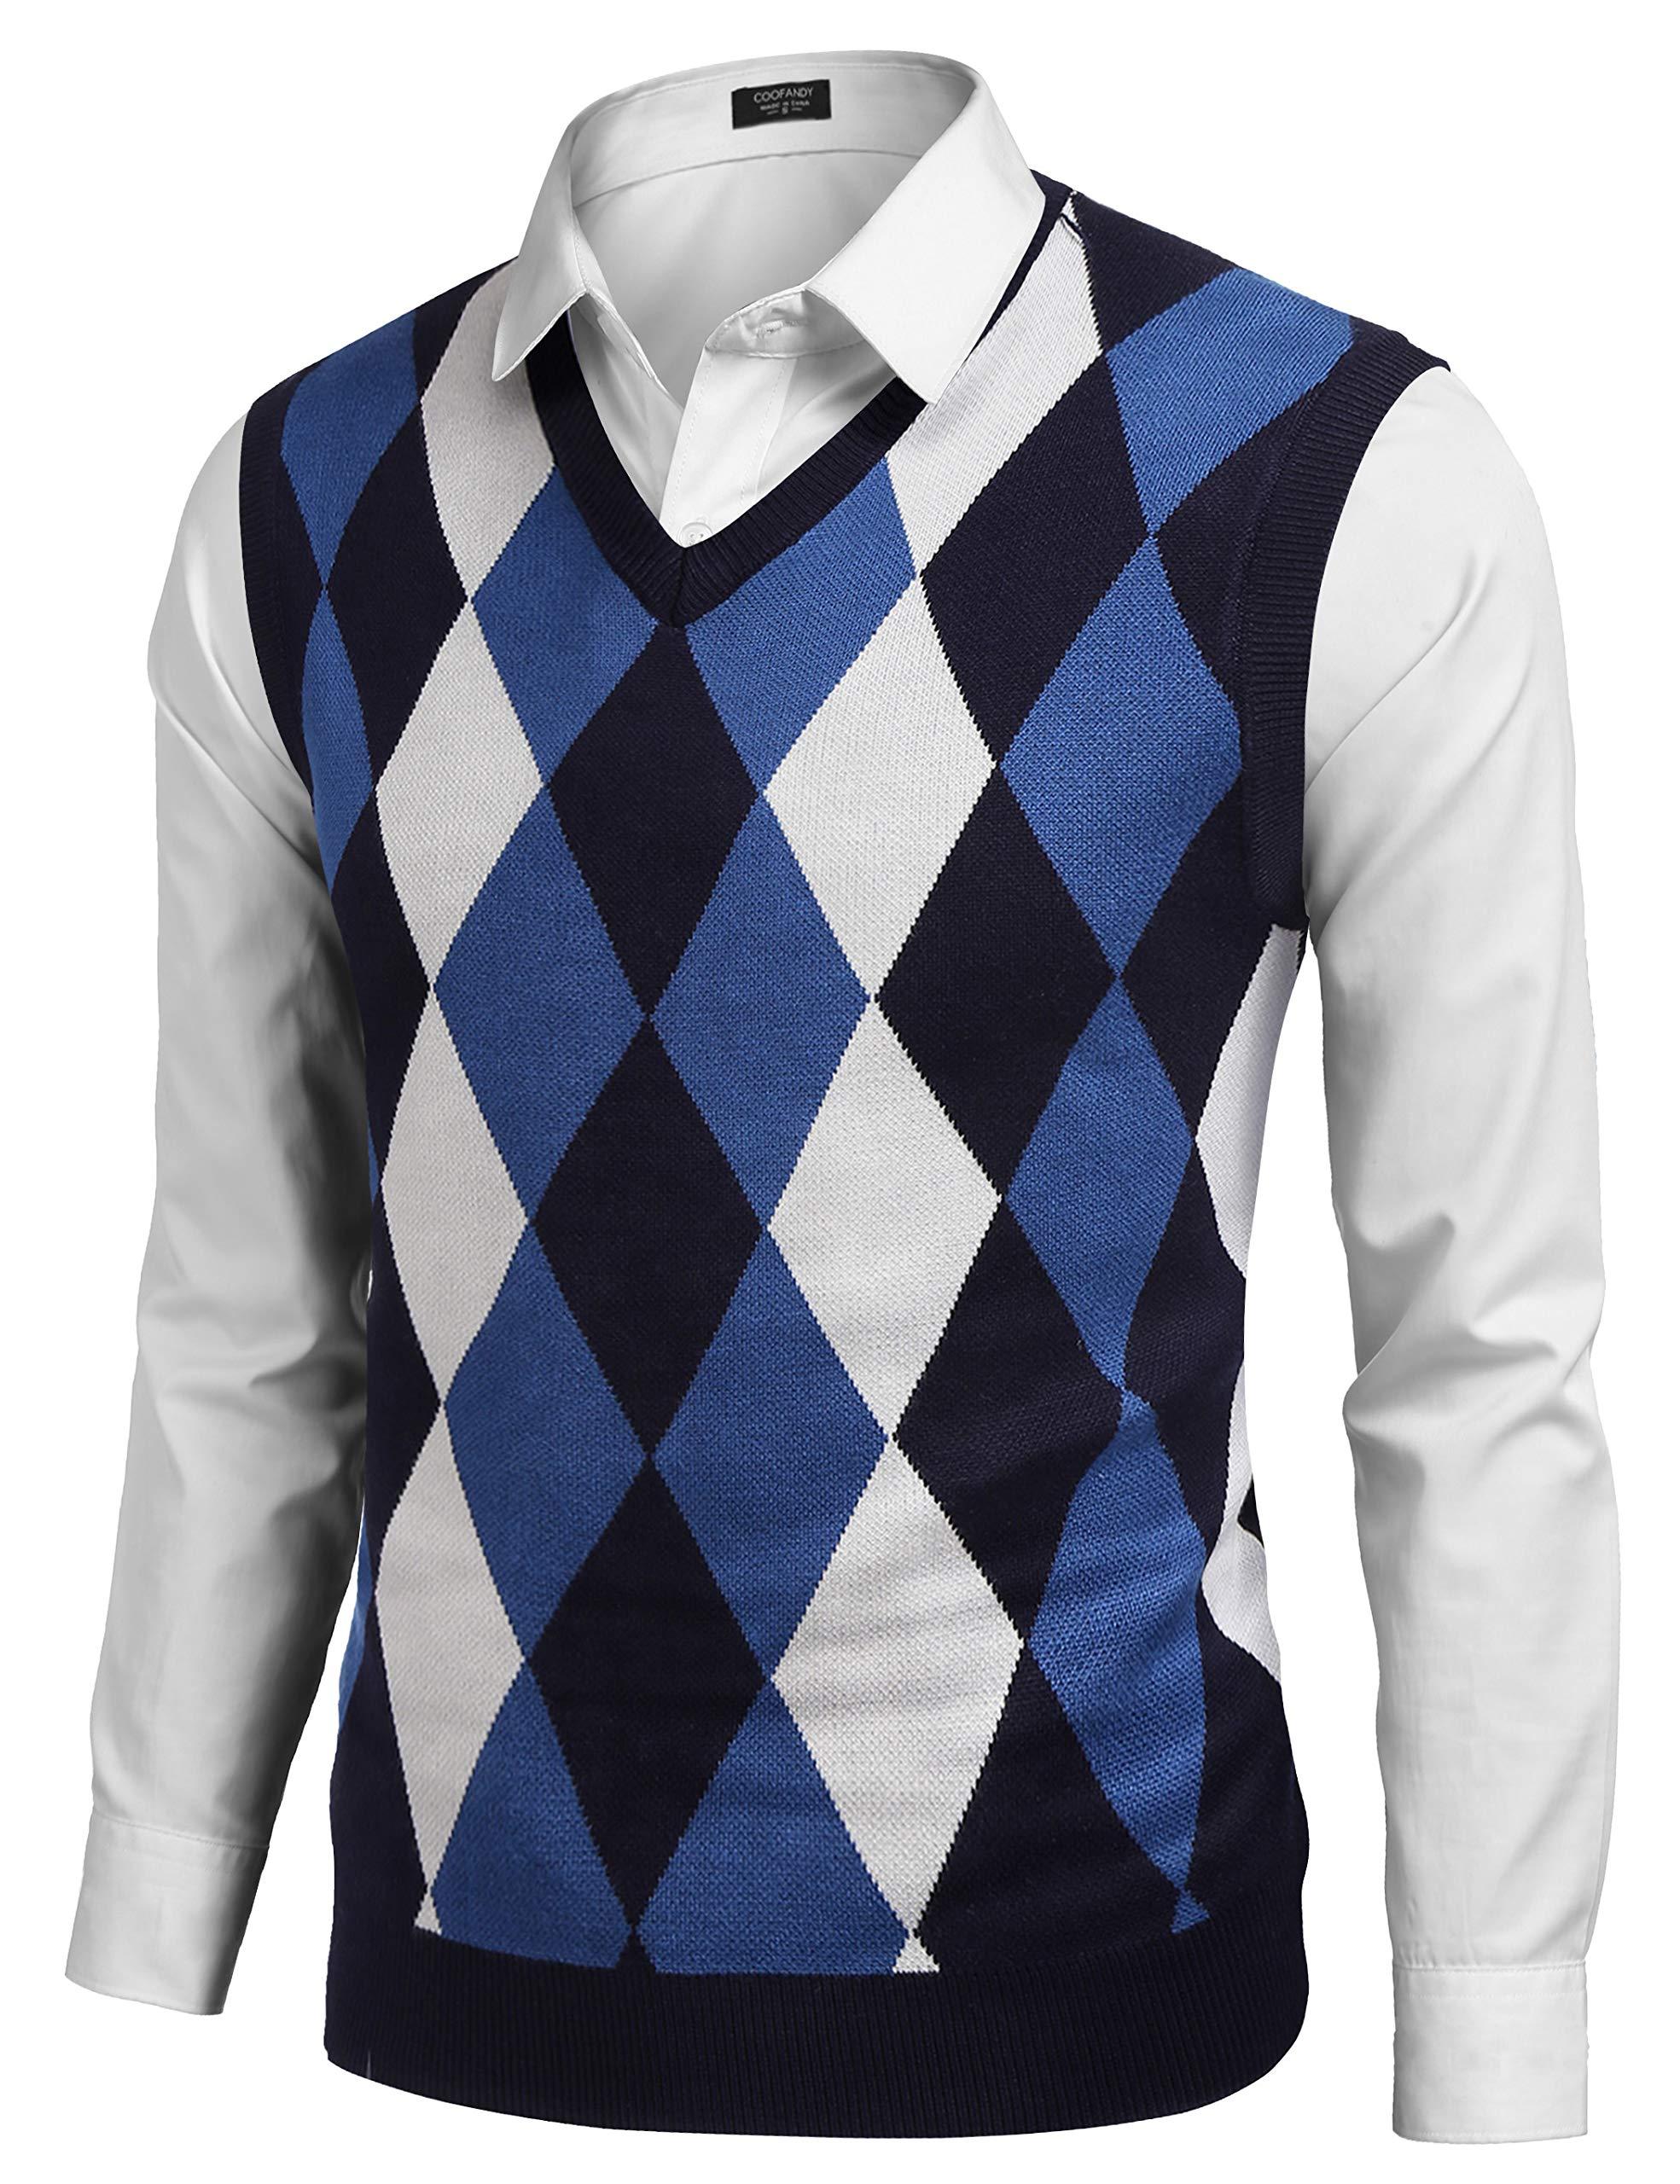 JINIDU Mens V-Neck Casual Slim Fit Golf Knit Vest Sleeveless Sweater Pullover Navy Blue by JINIDU